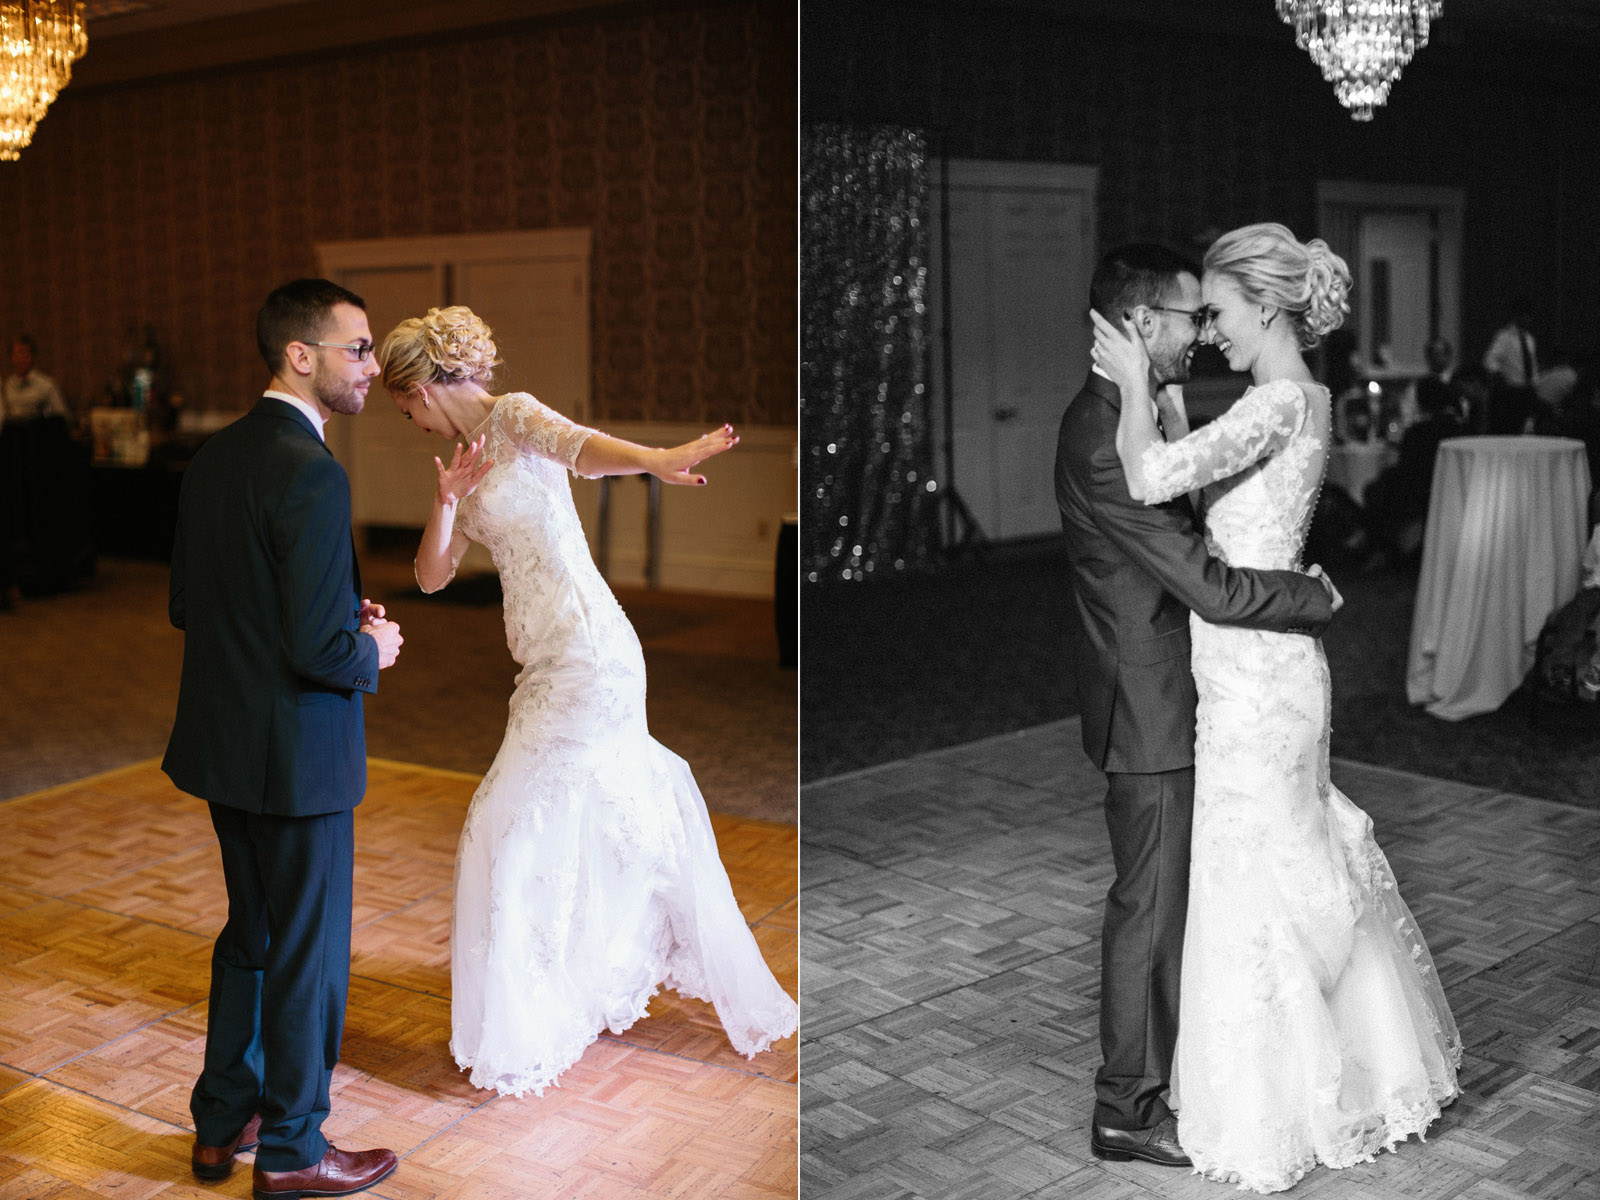 Jenna&Austin_SiouxFalls_Wedding_Photographer_103.jpg